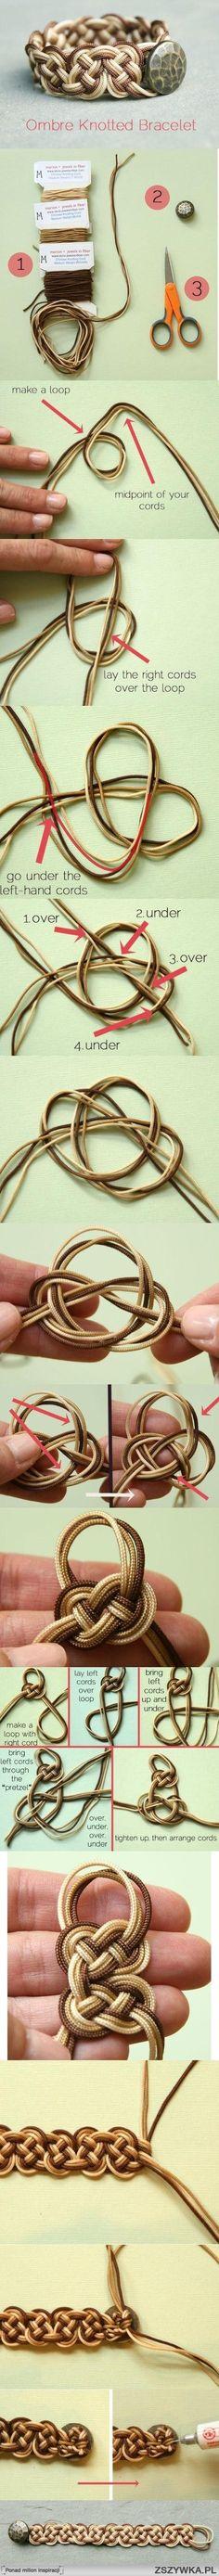 Hand-woven bracelets